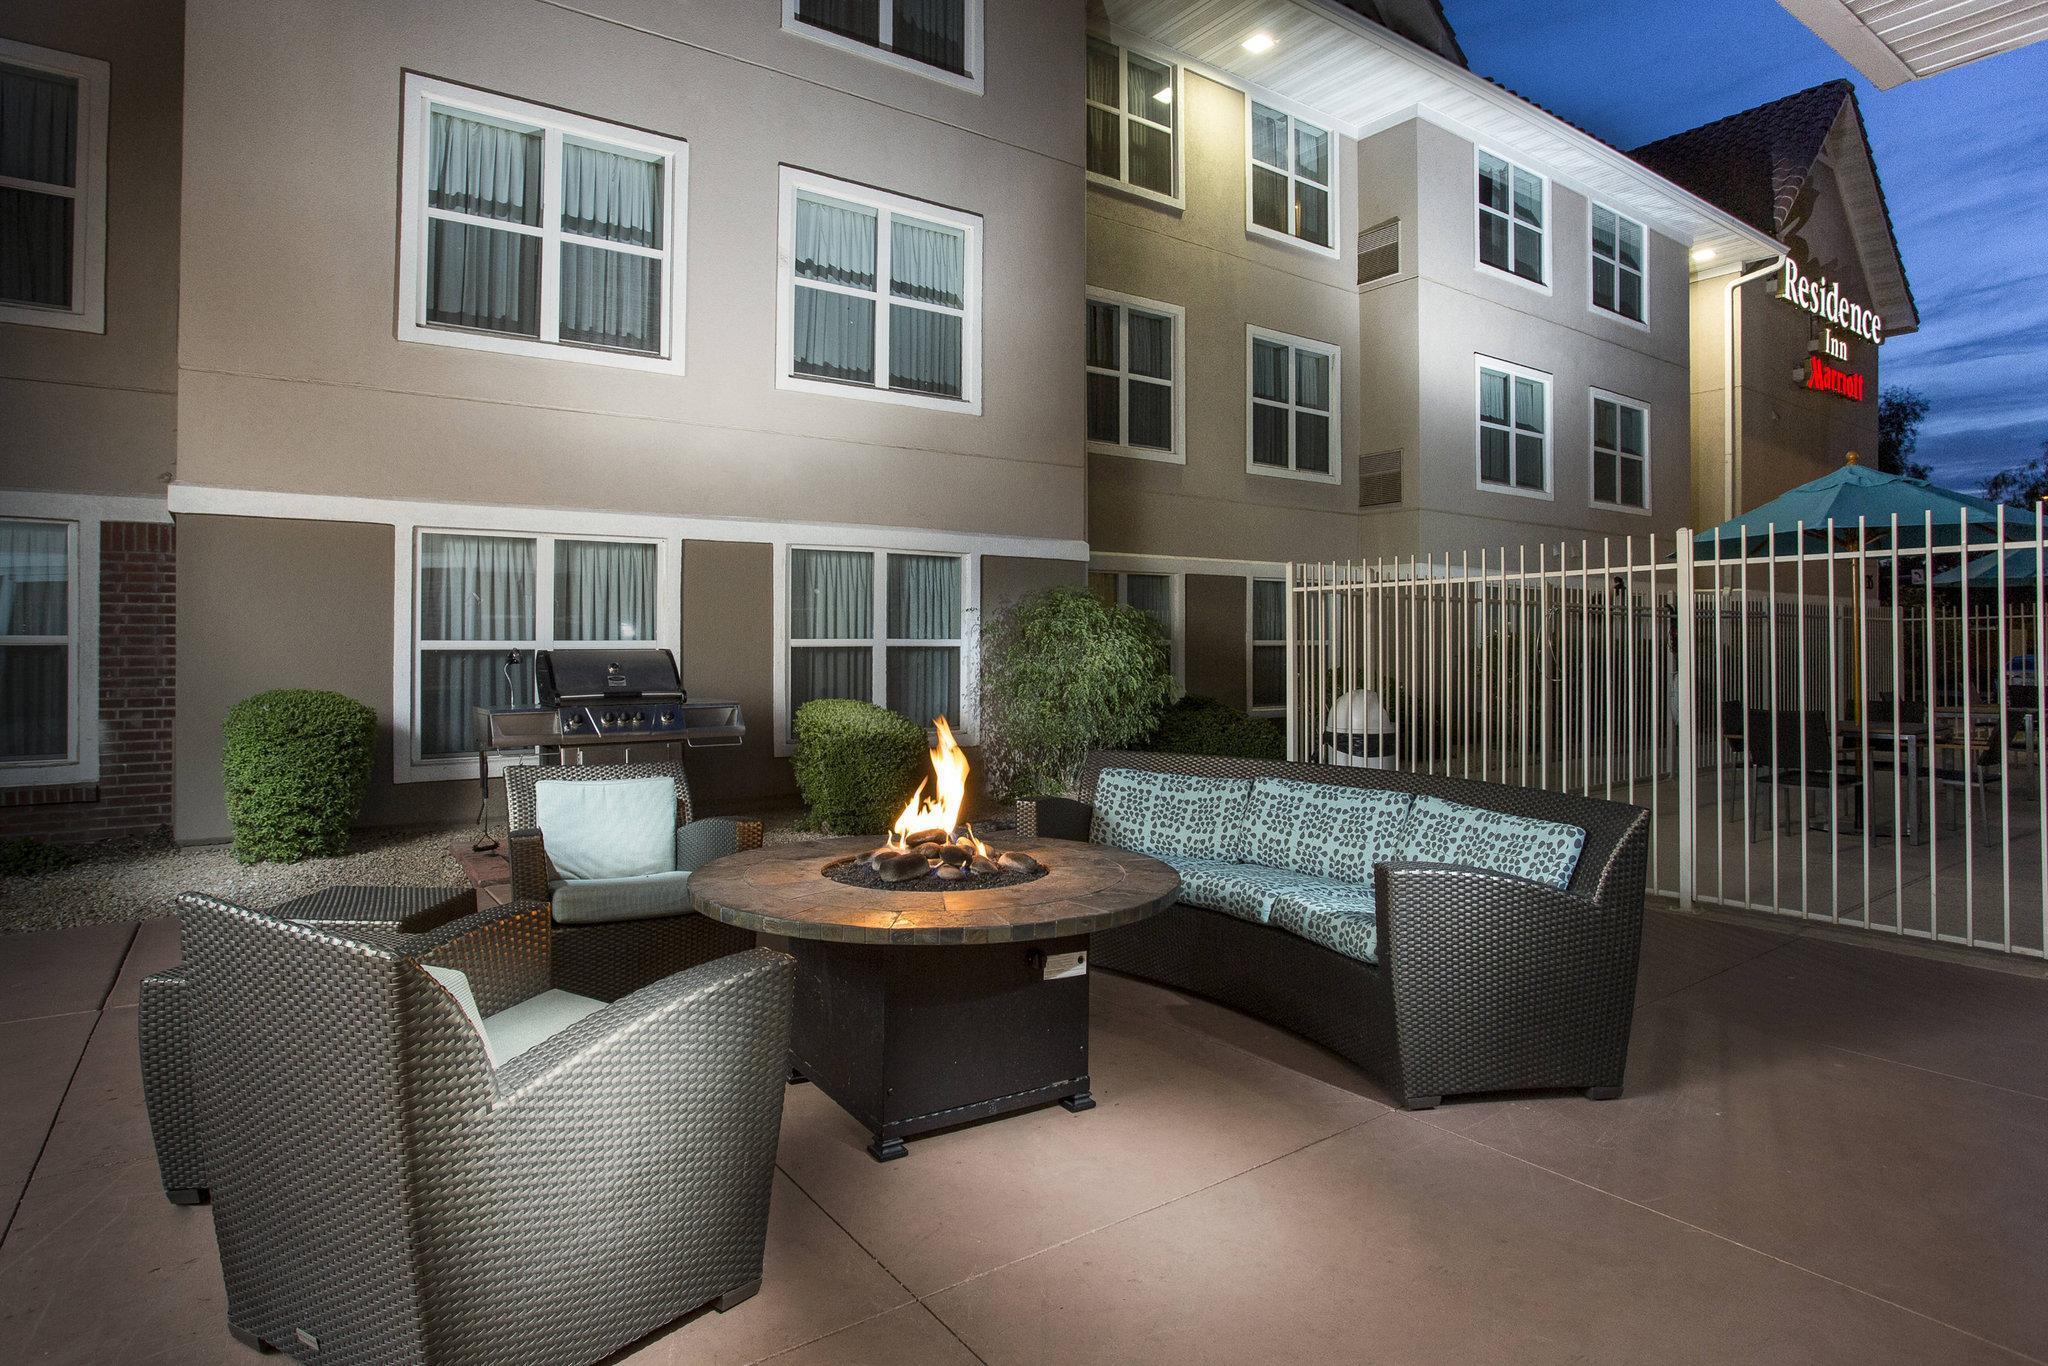 Residence Inn Phoenix Glendale Peoria